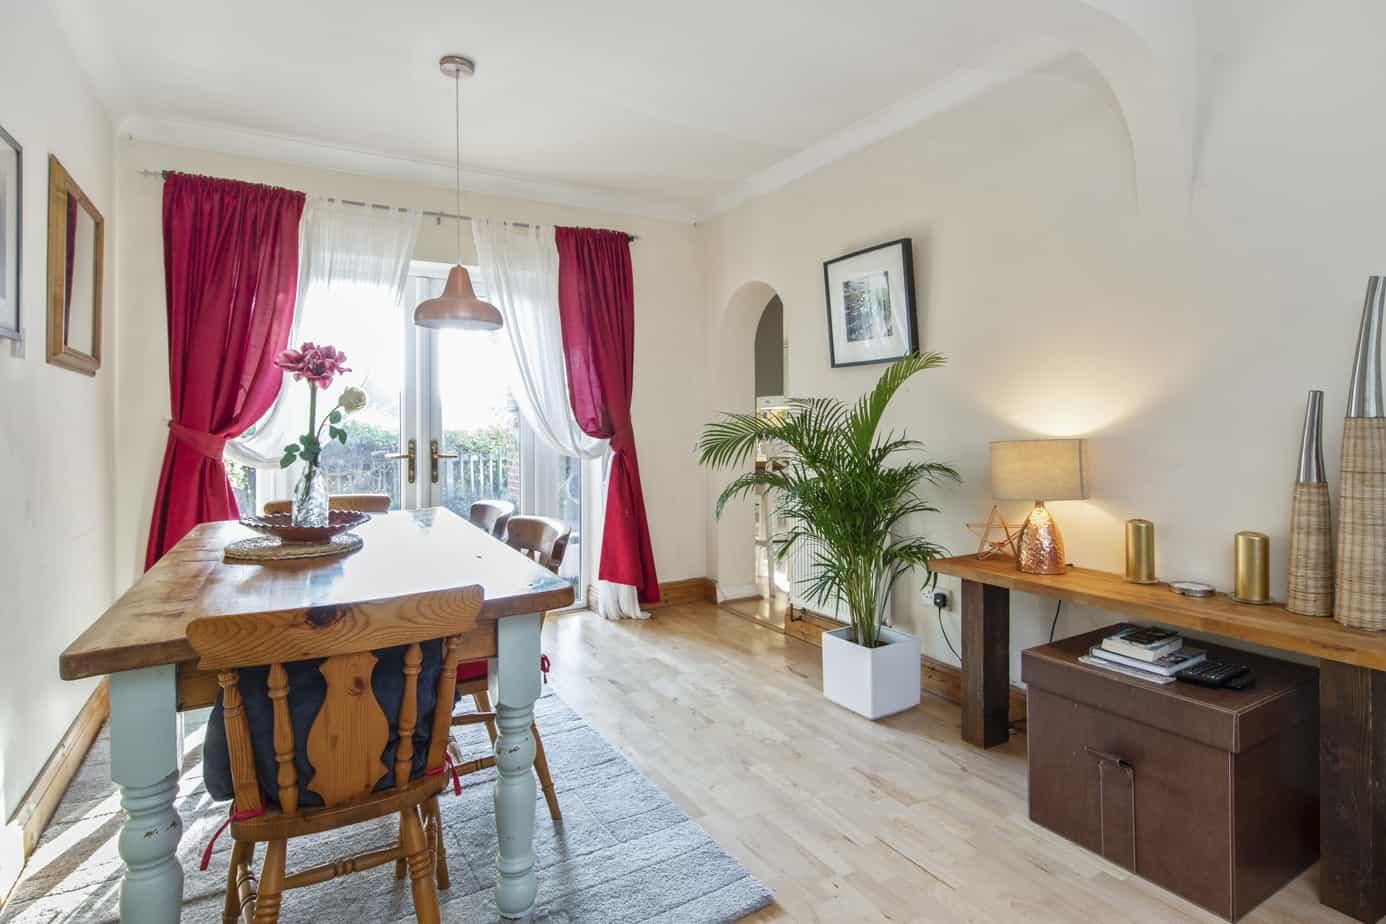 Upper Road Denham, UB9 5EJ - Sitting Room